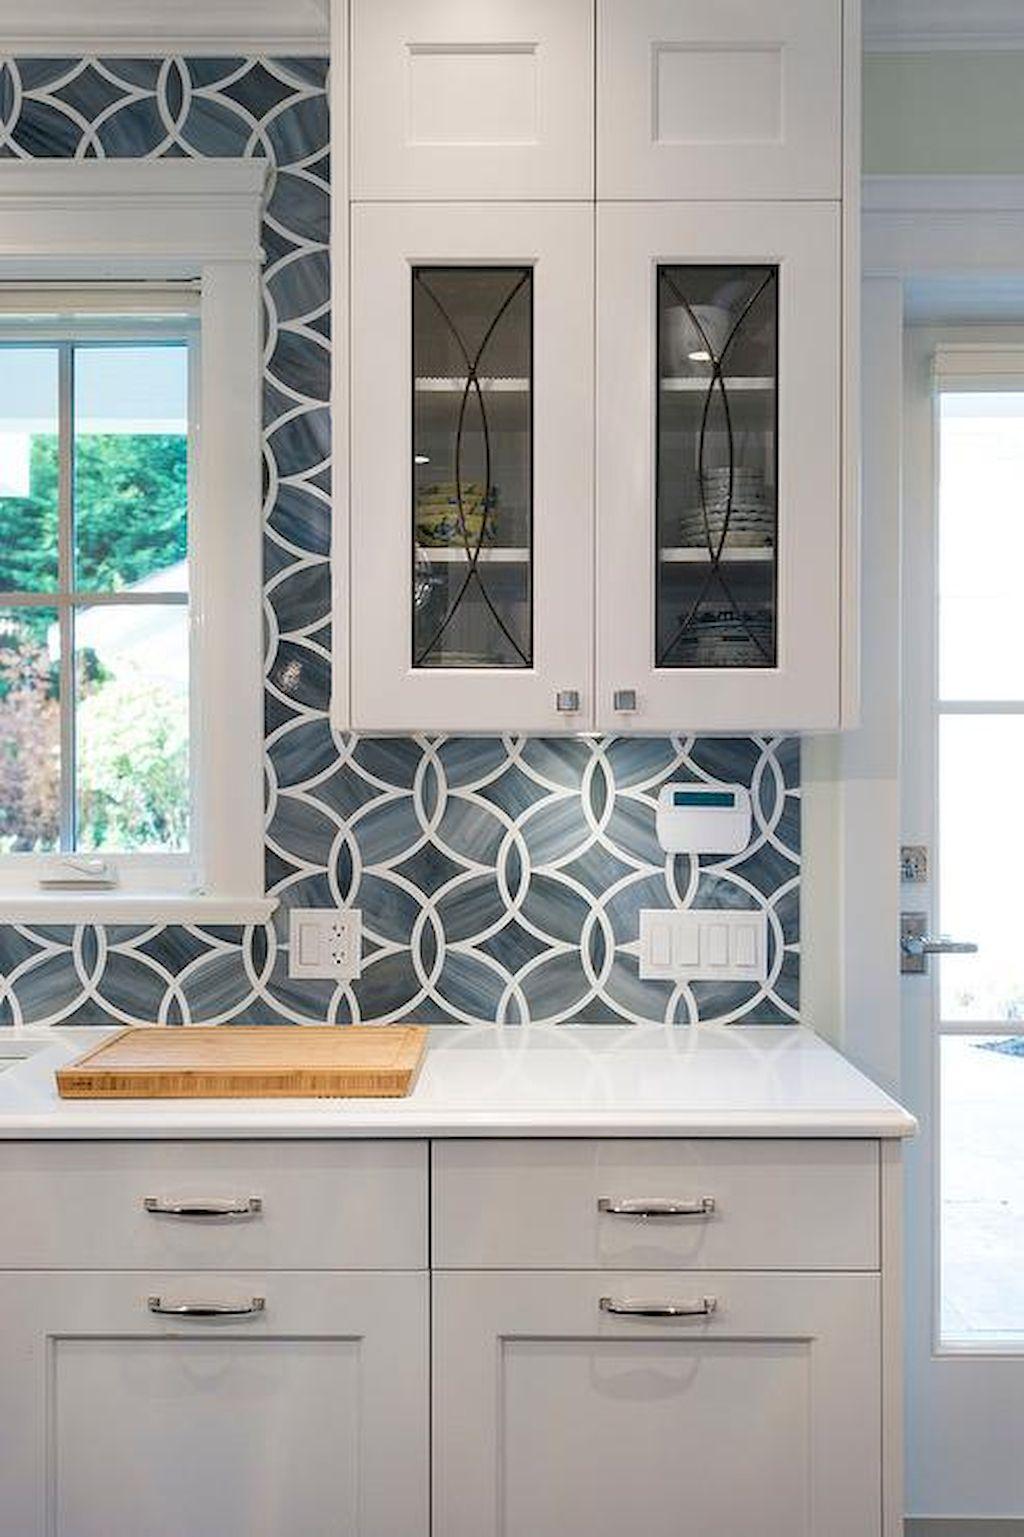 kitchen backsplash tile patterns ideas